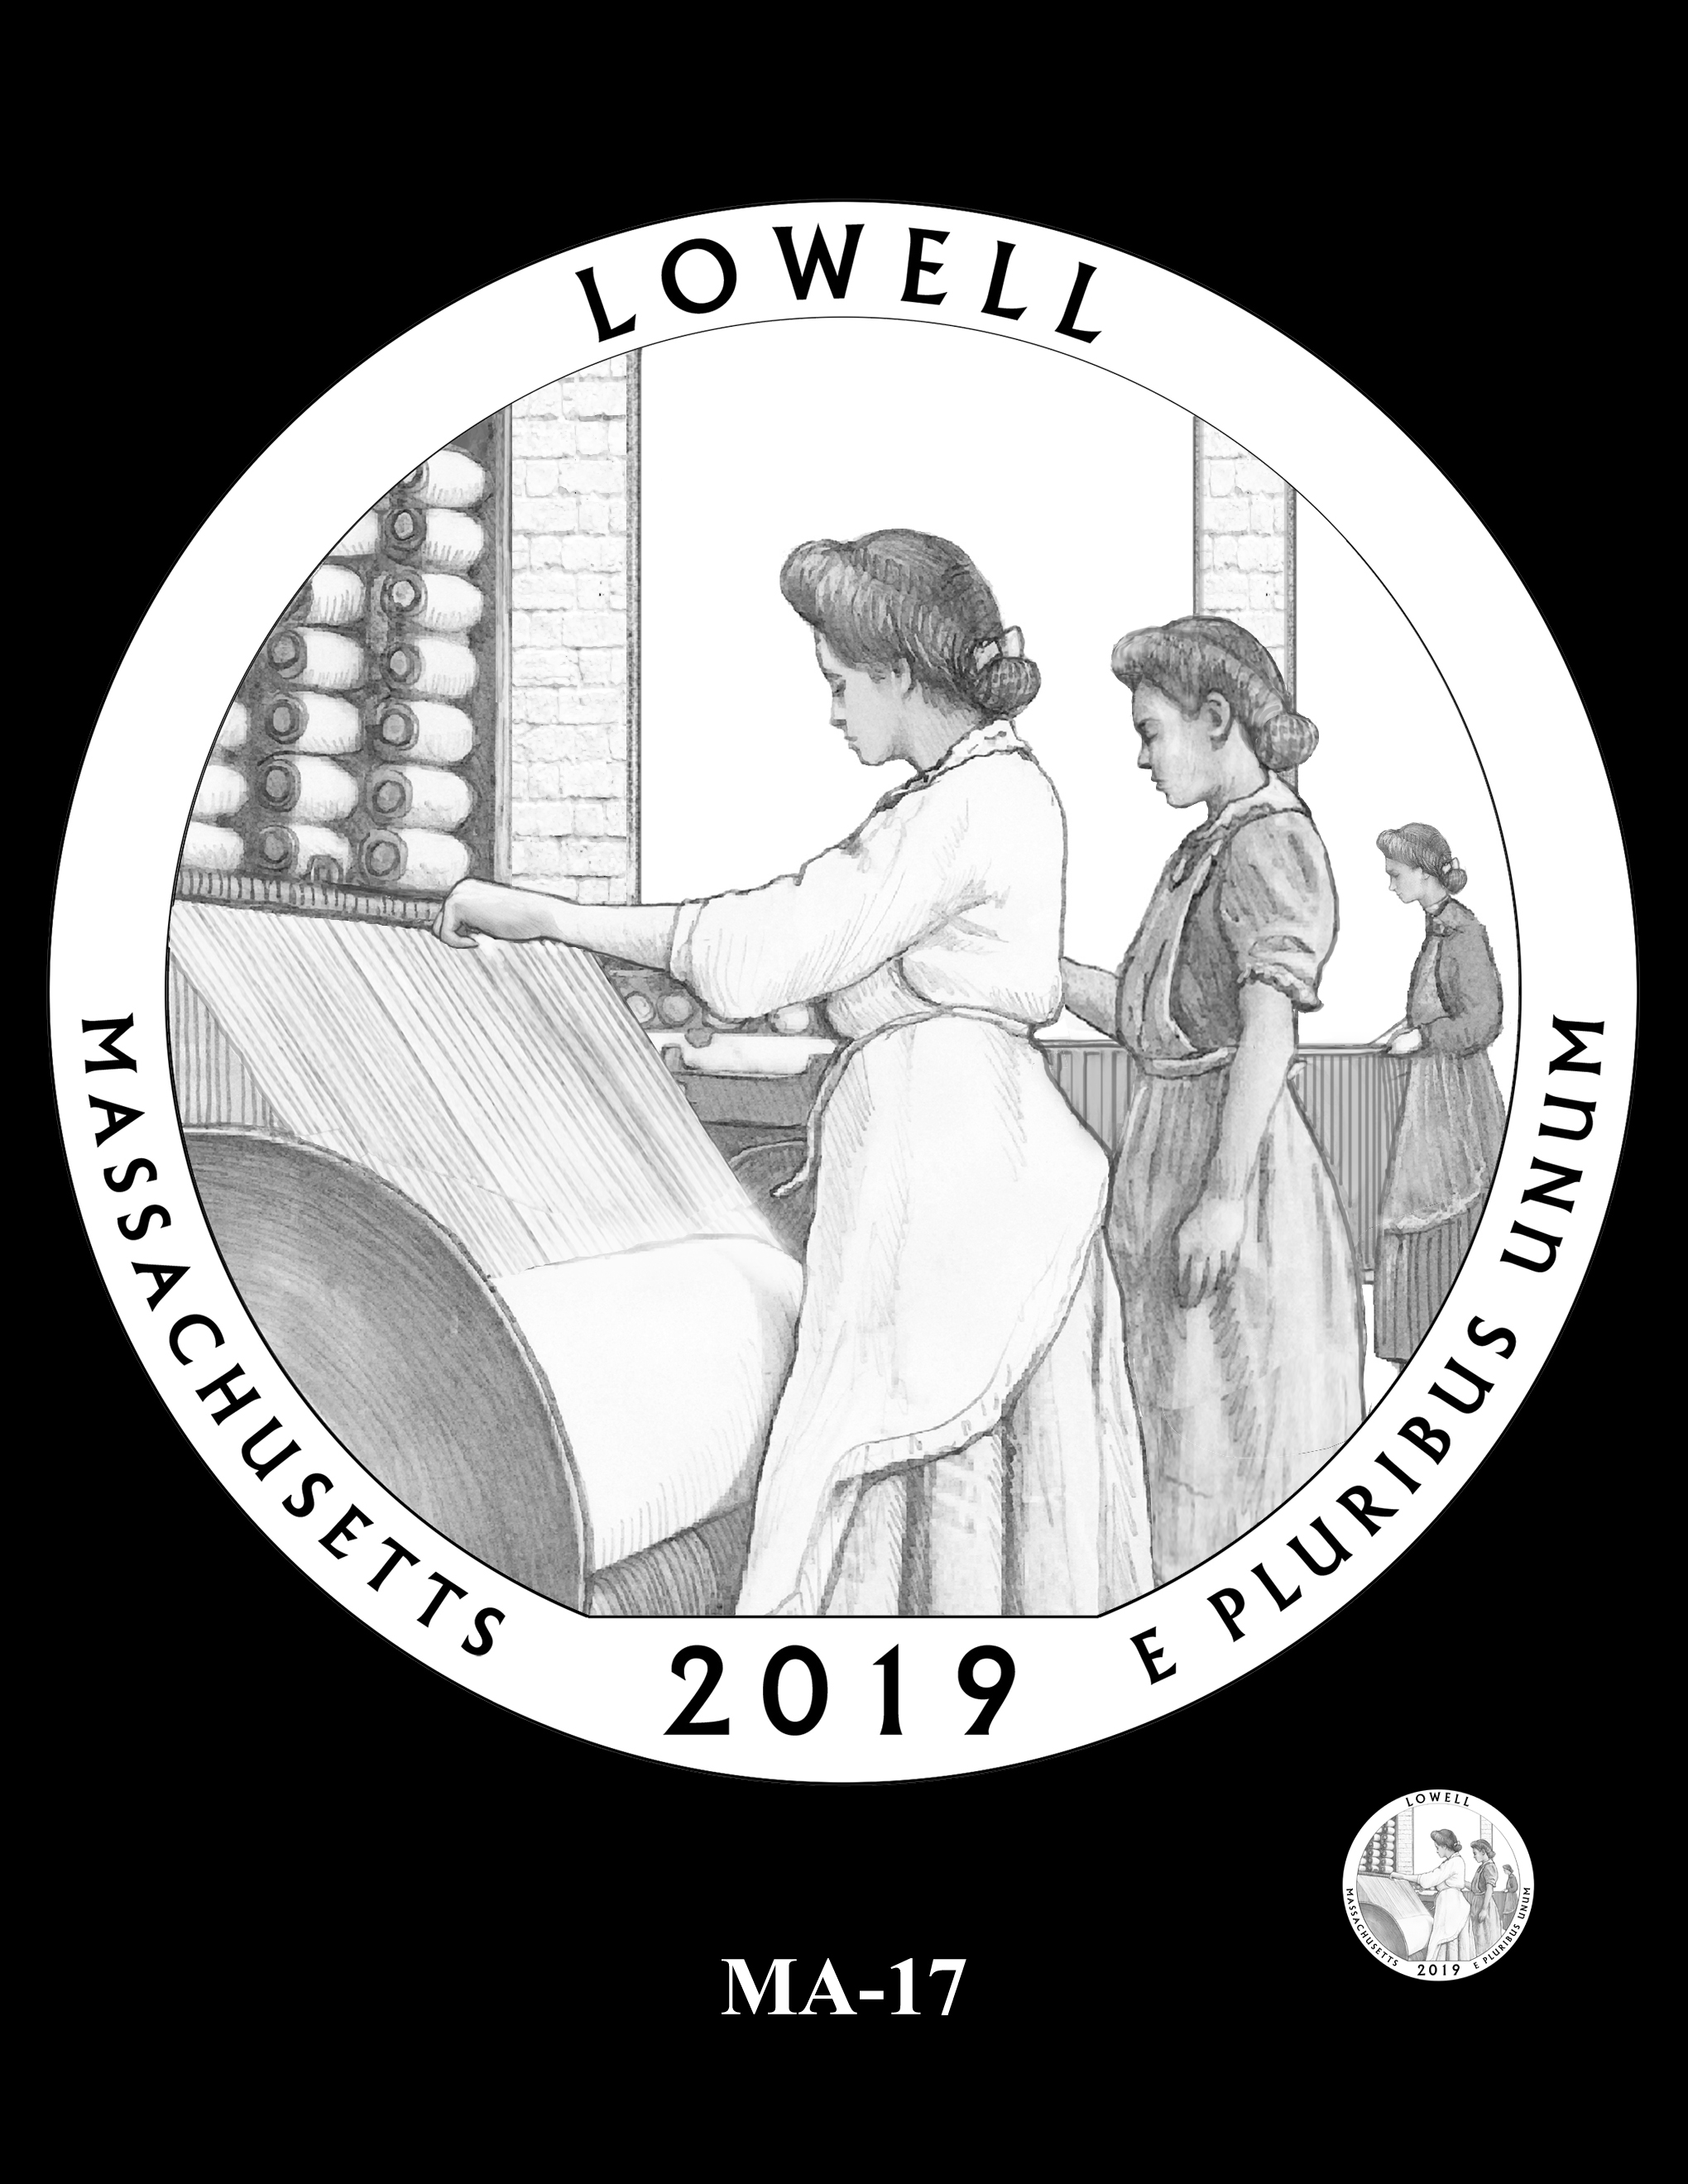 MA-17 -- 2019 America the Beautiful Quarters® Program